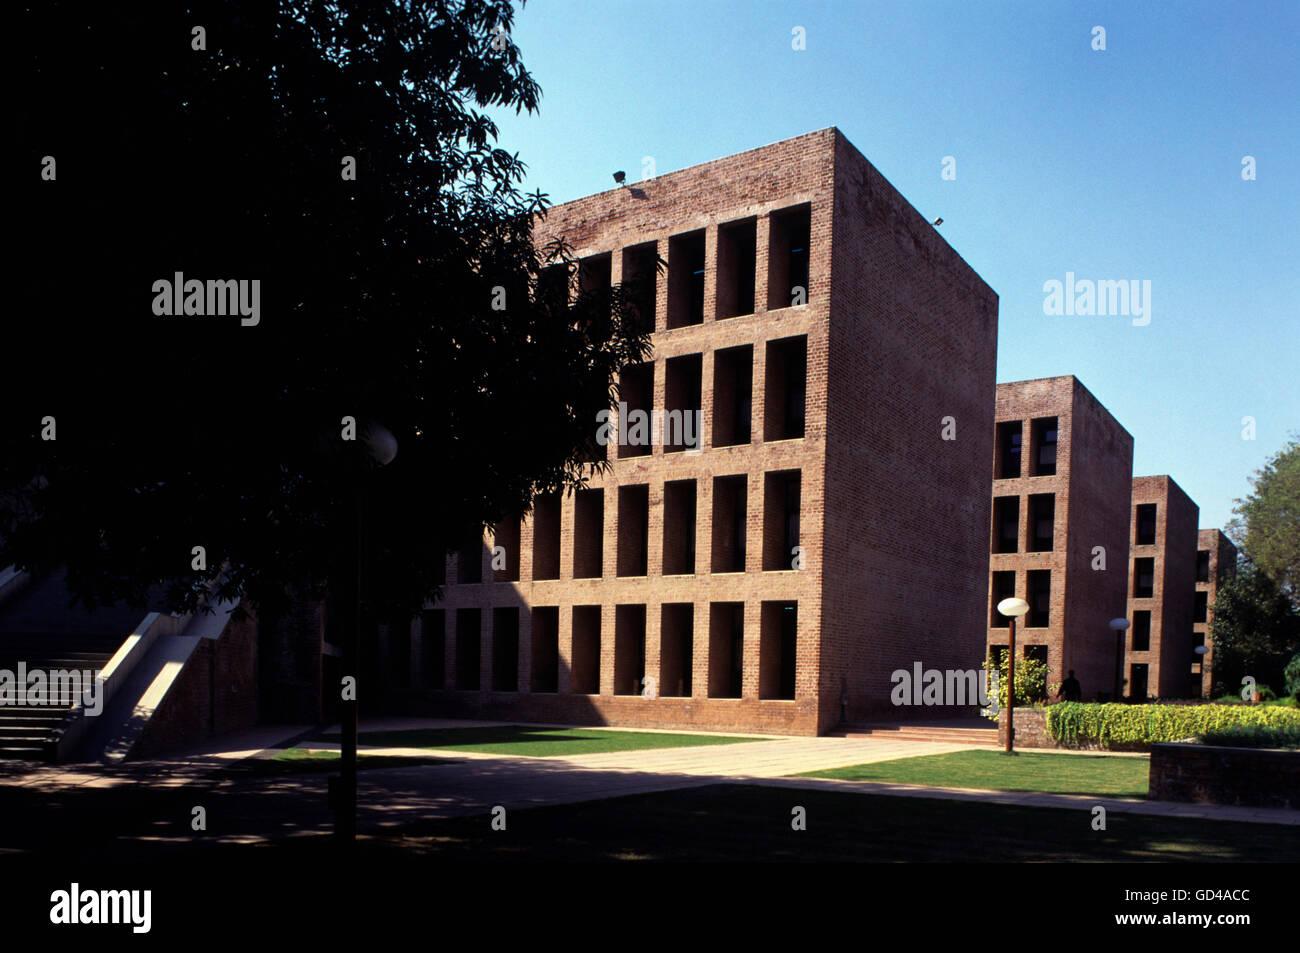 Indian Institute of Management - Stock Image